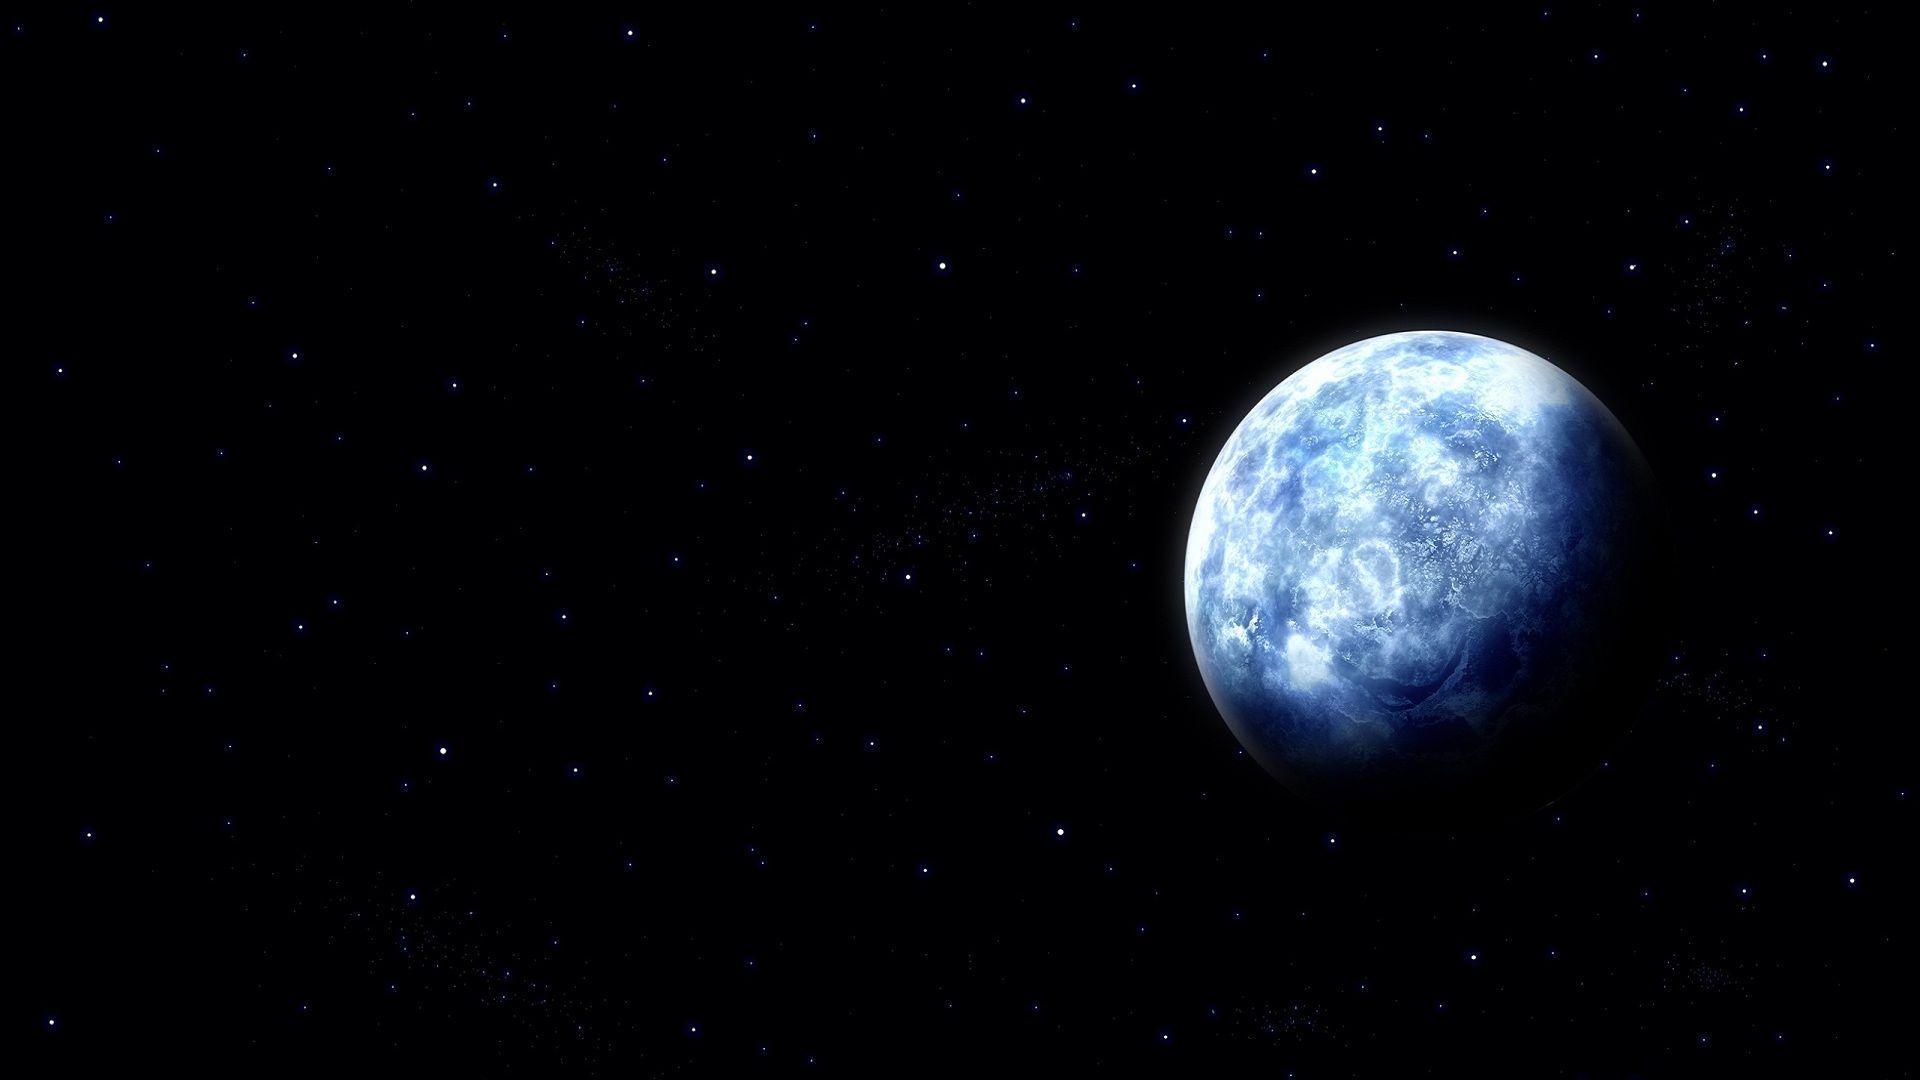 Planet Aesthetic Desktop Wallpapers - Top Free Planet ...